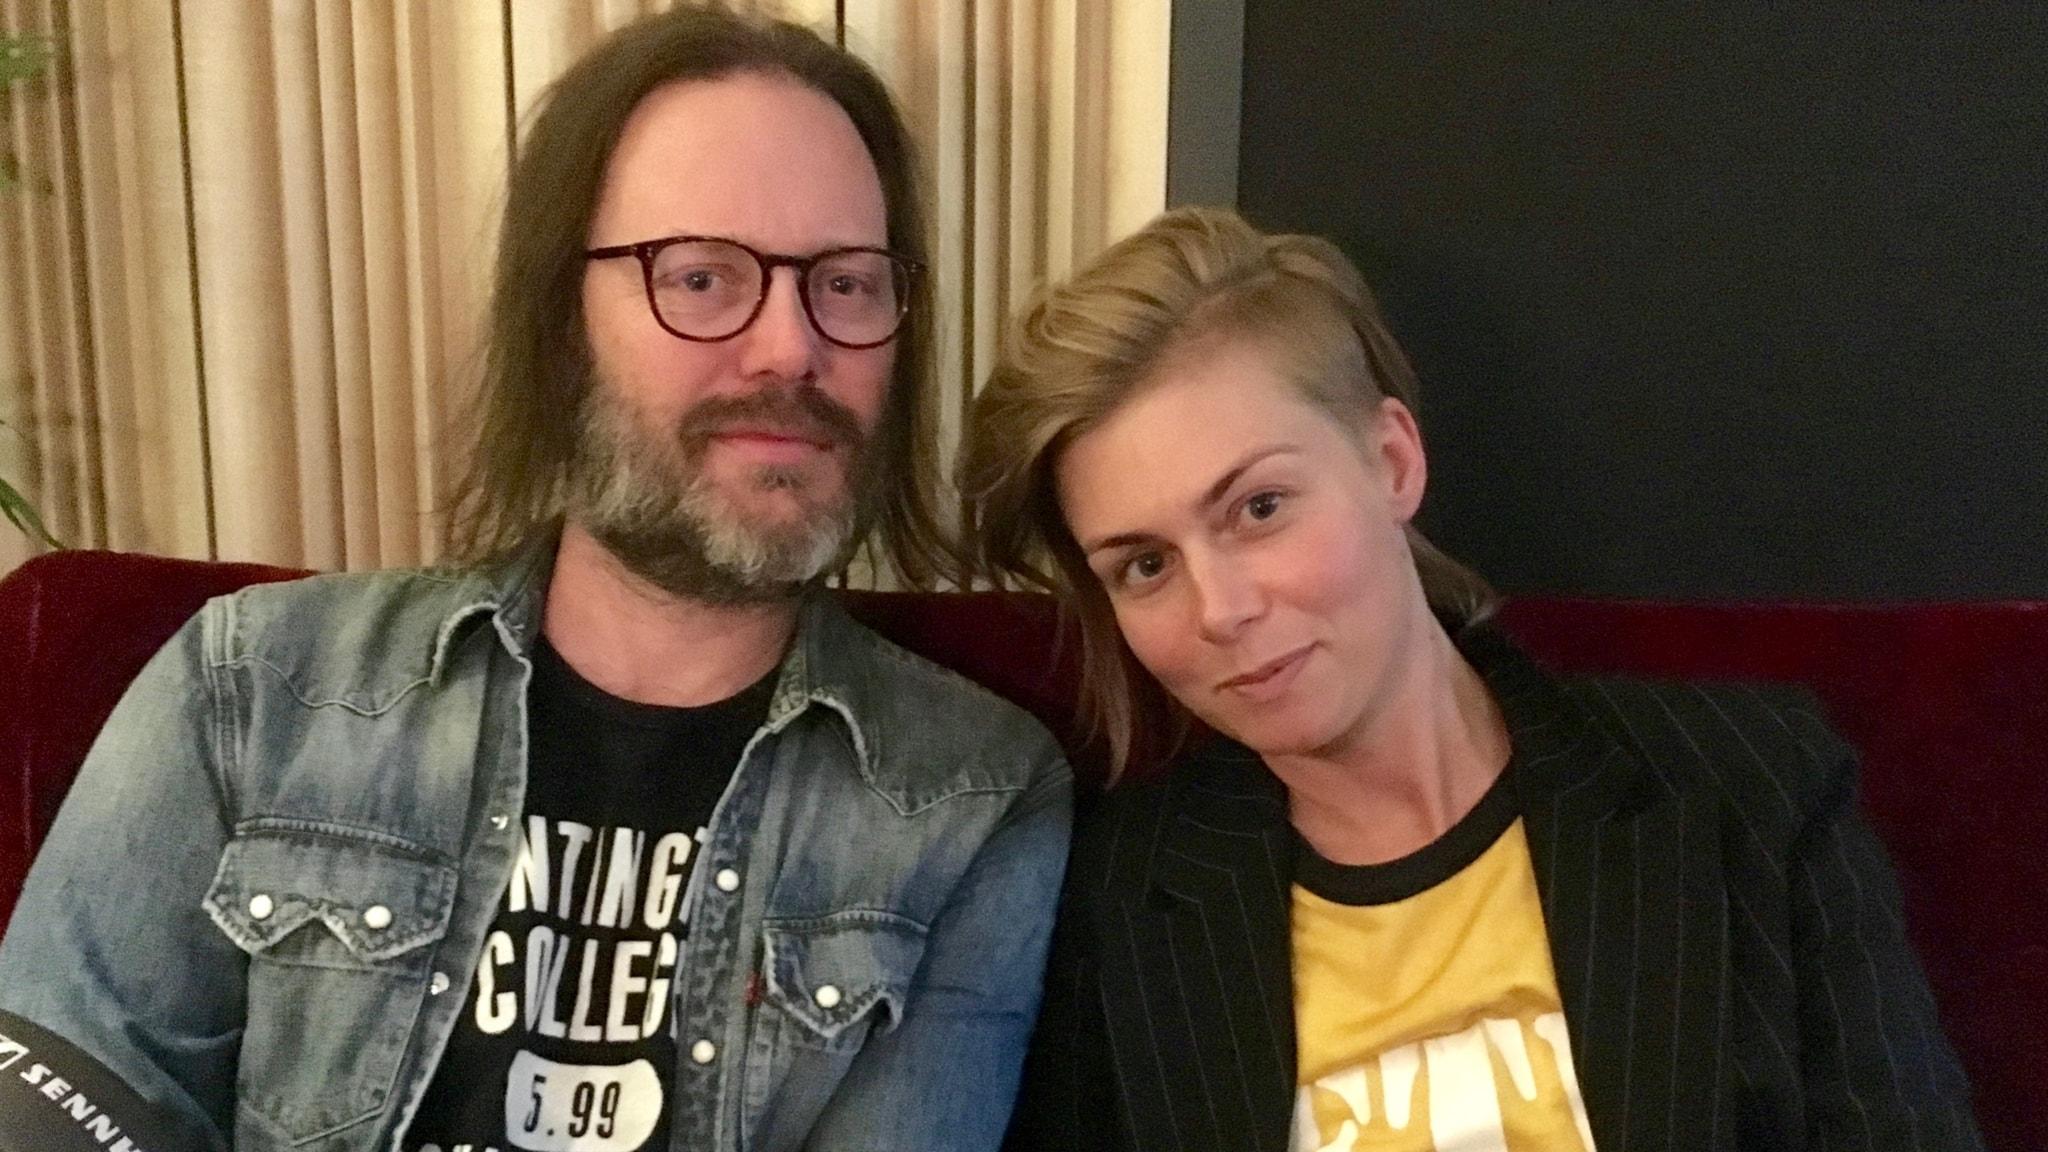 Musikspecial i P4: Anna Ternheim möter Niclas Frisk